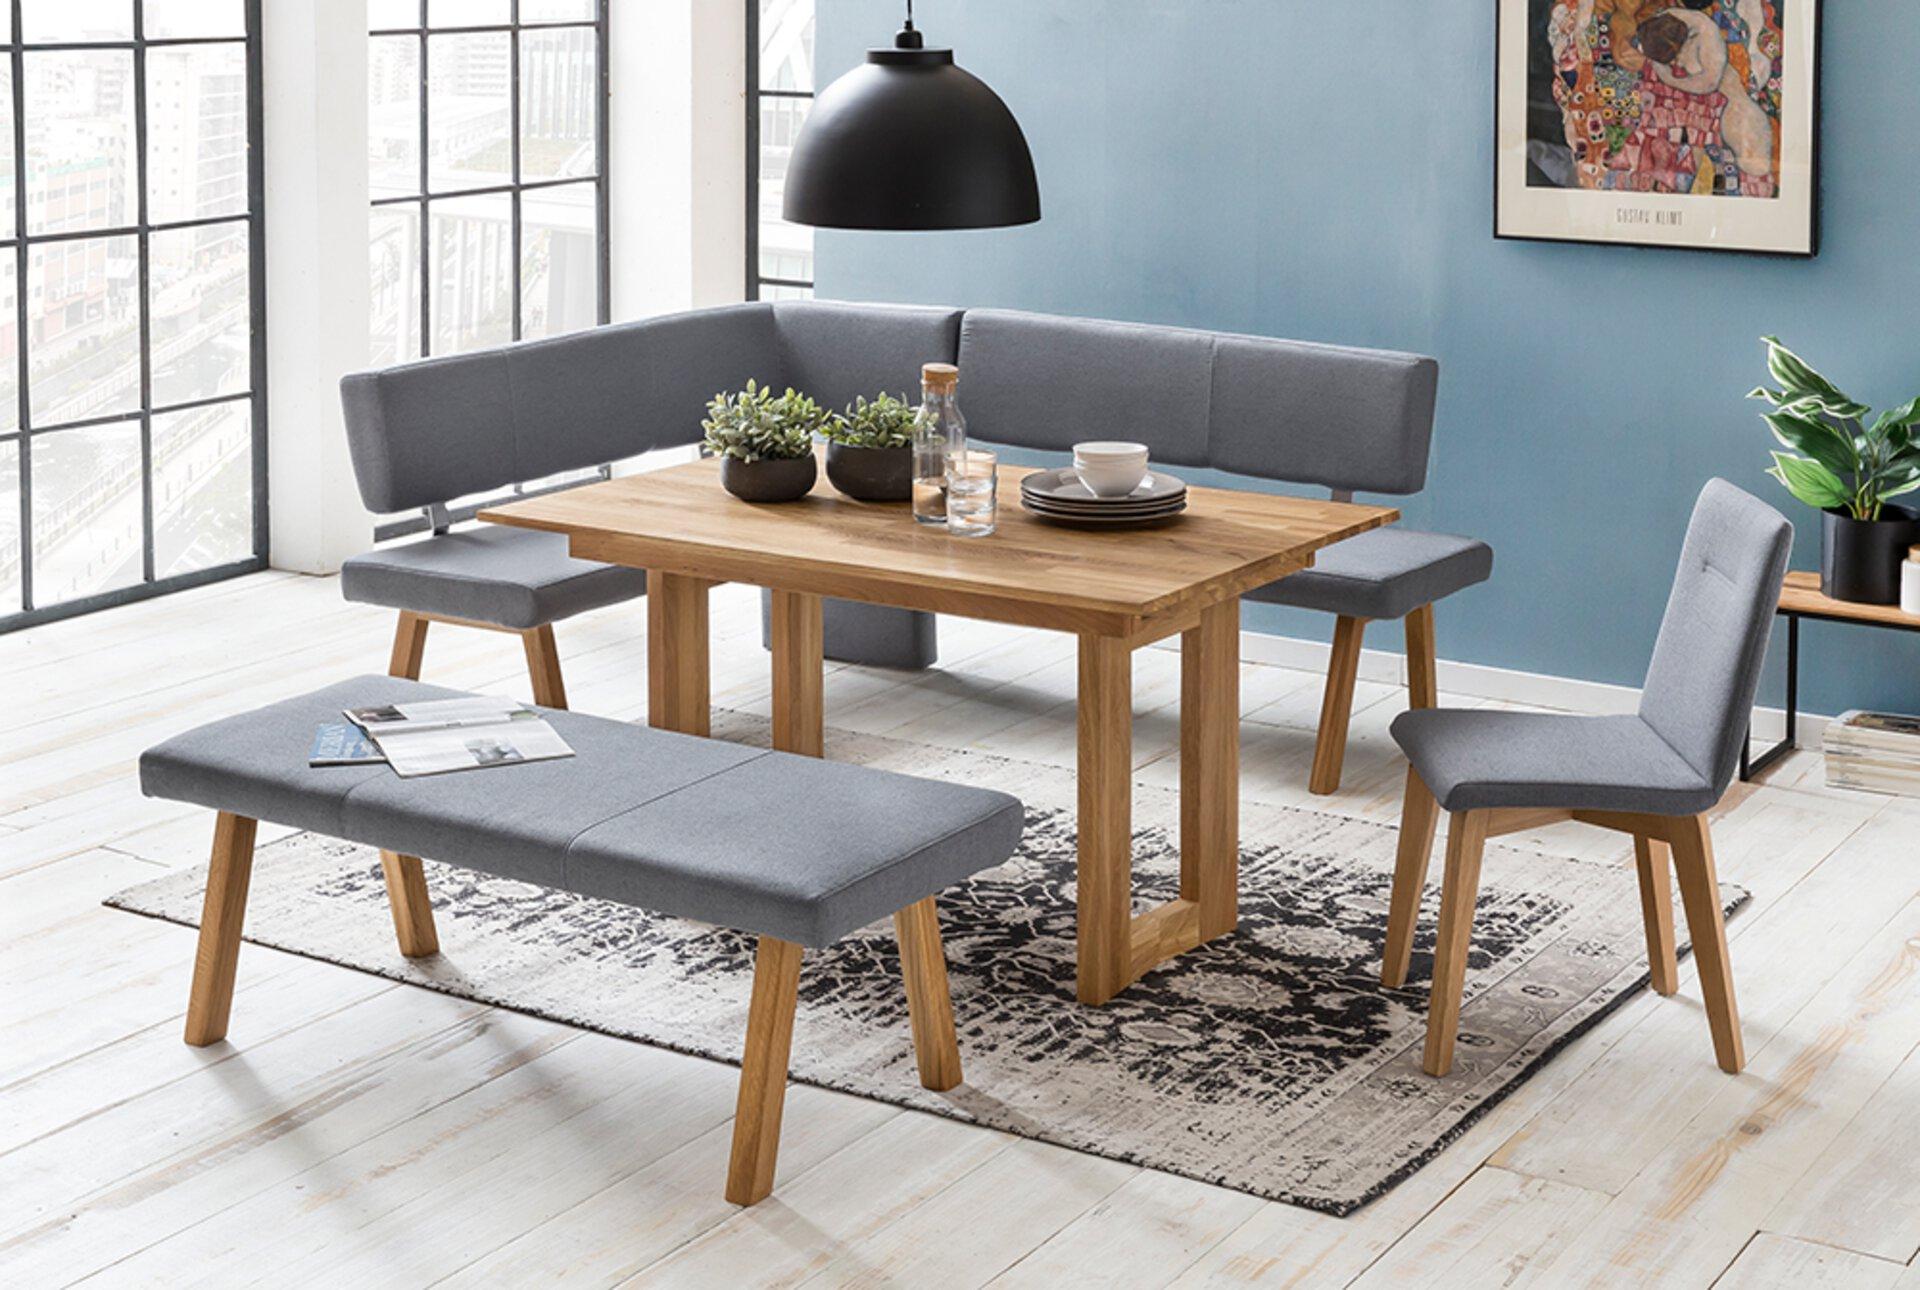 Stuhl ONTARIO Dinett Textil 56 x 88 x 44 cm